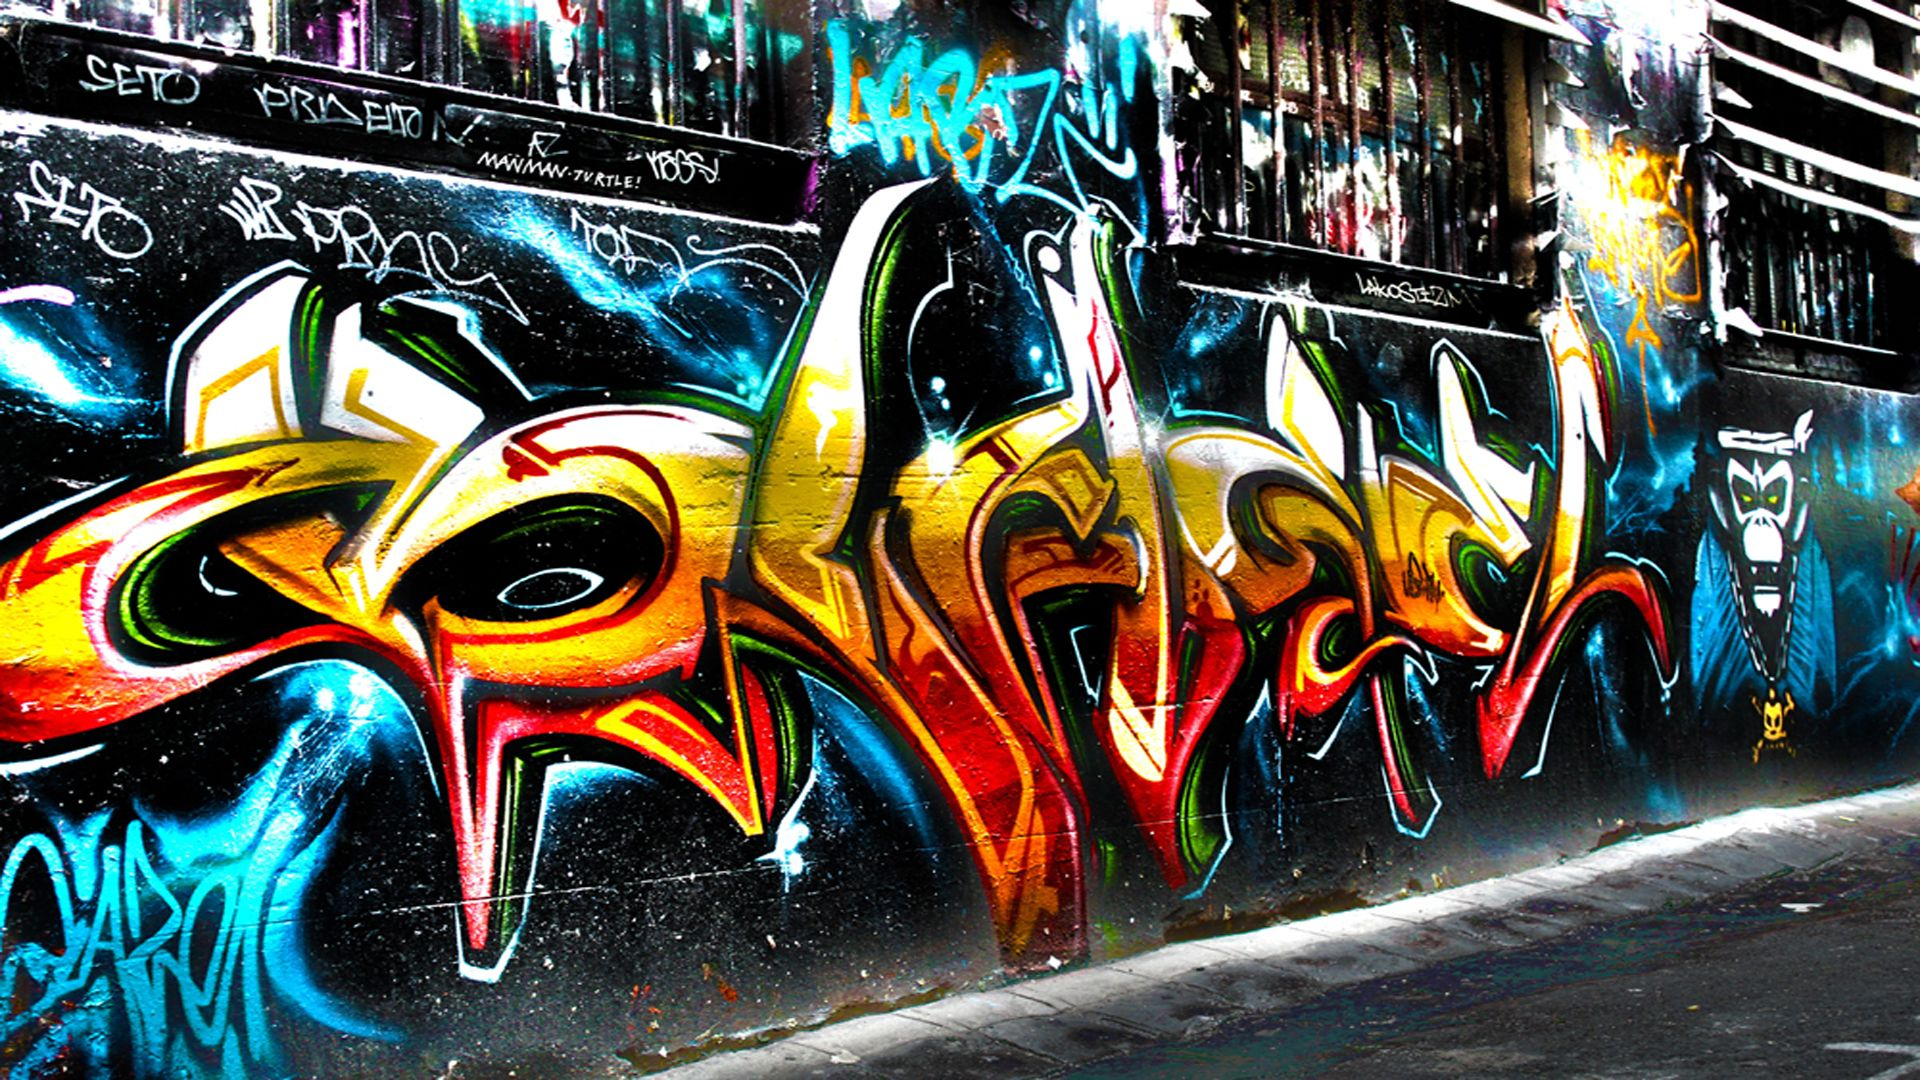 Cool Graffiti Art Wallpaper Free Download | Wallpaper HD | Graffiti wallpaper, Street art ...